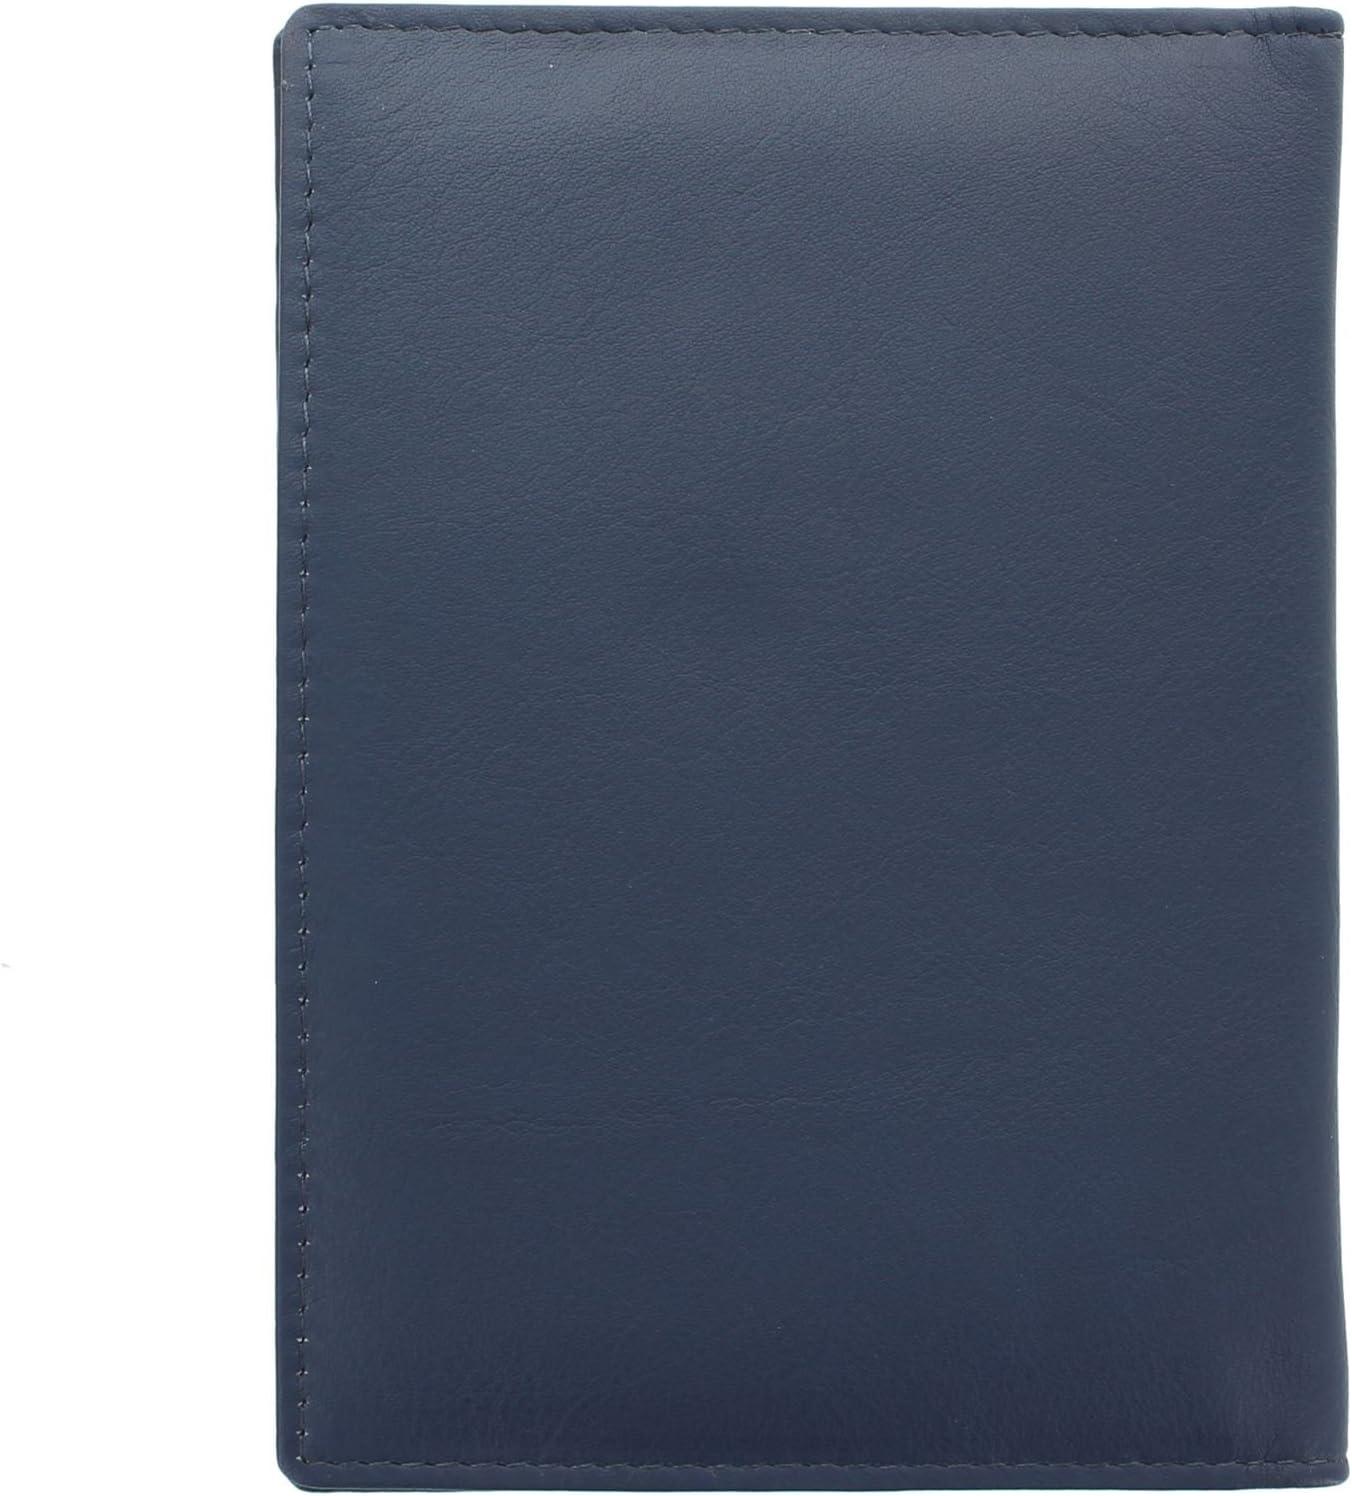 Mala Leather Colecci/ón LUCY Porta Pasaporte 209/_30 Azul marino